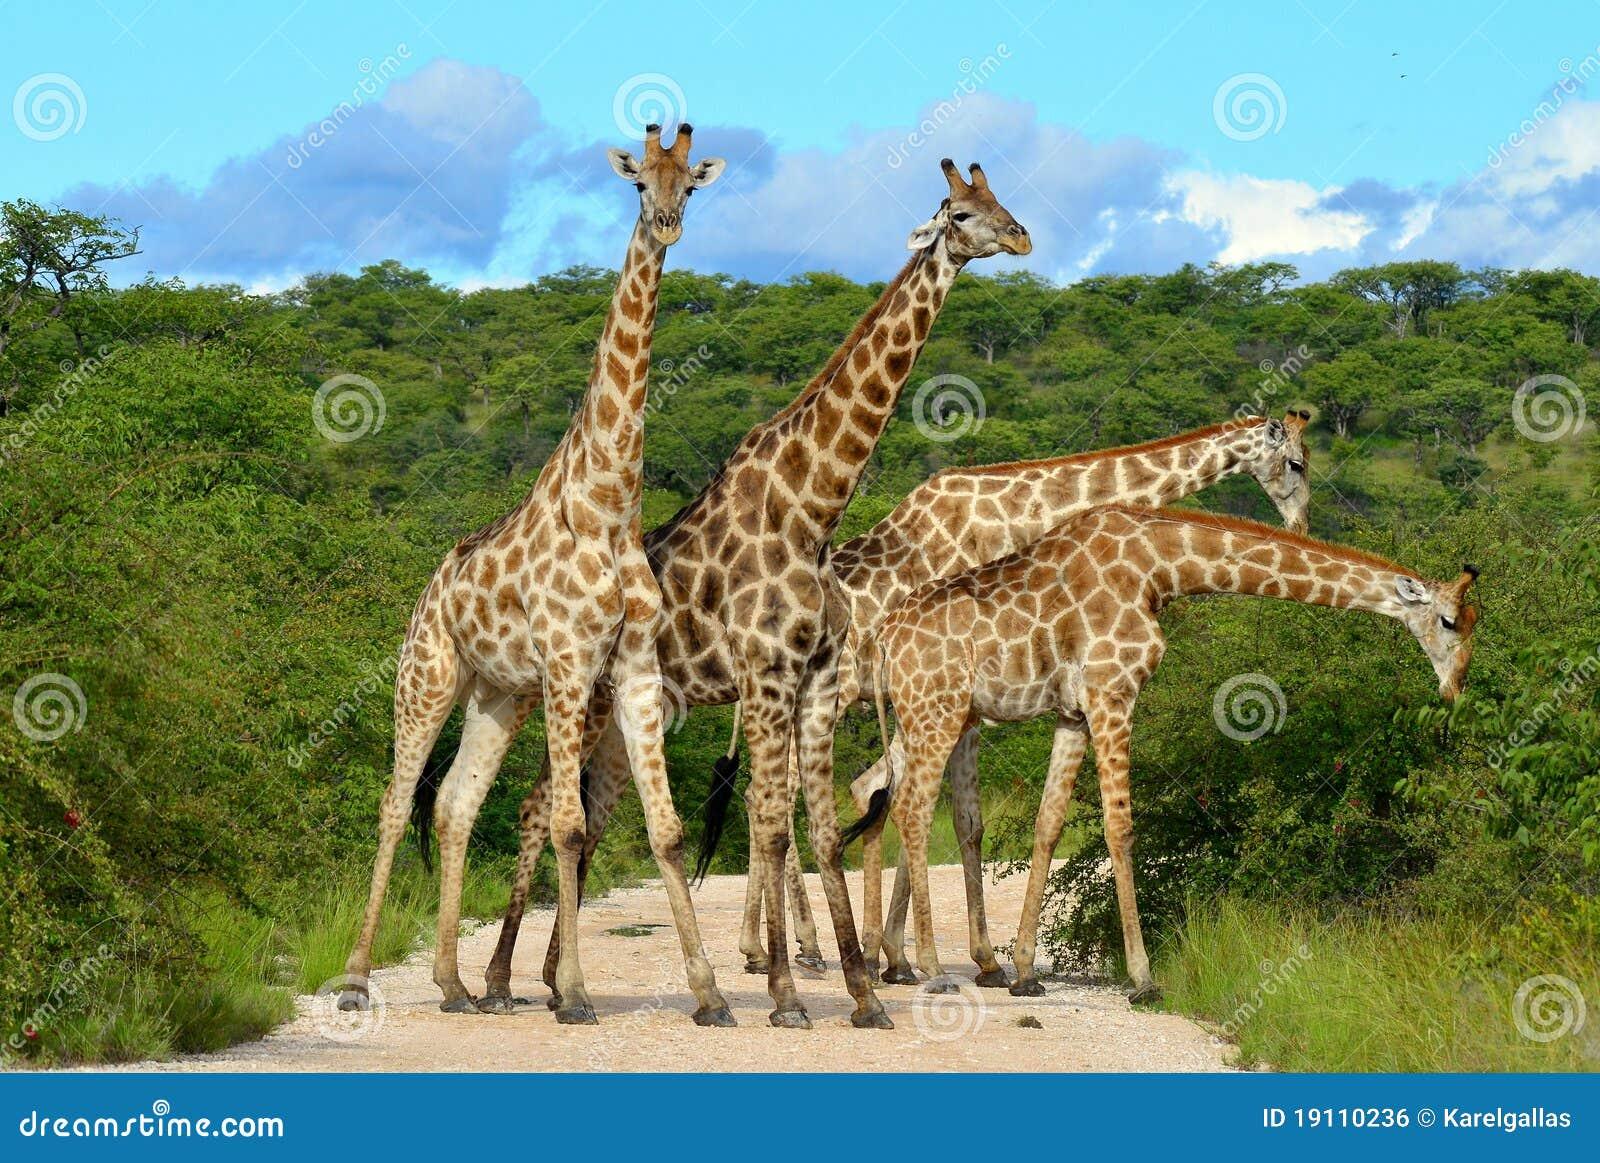 Giraffes overcrowding,Namibia